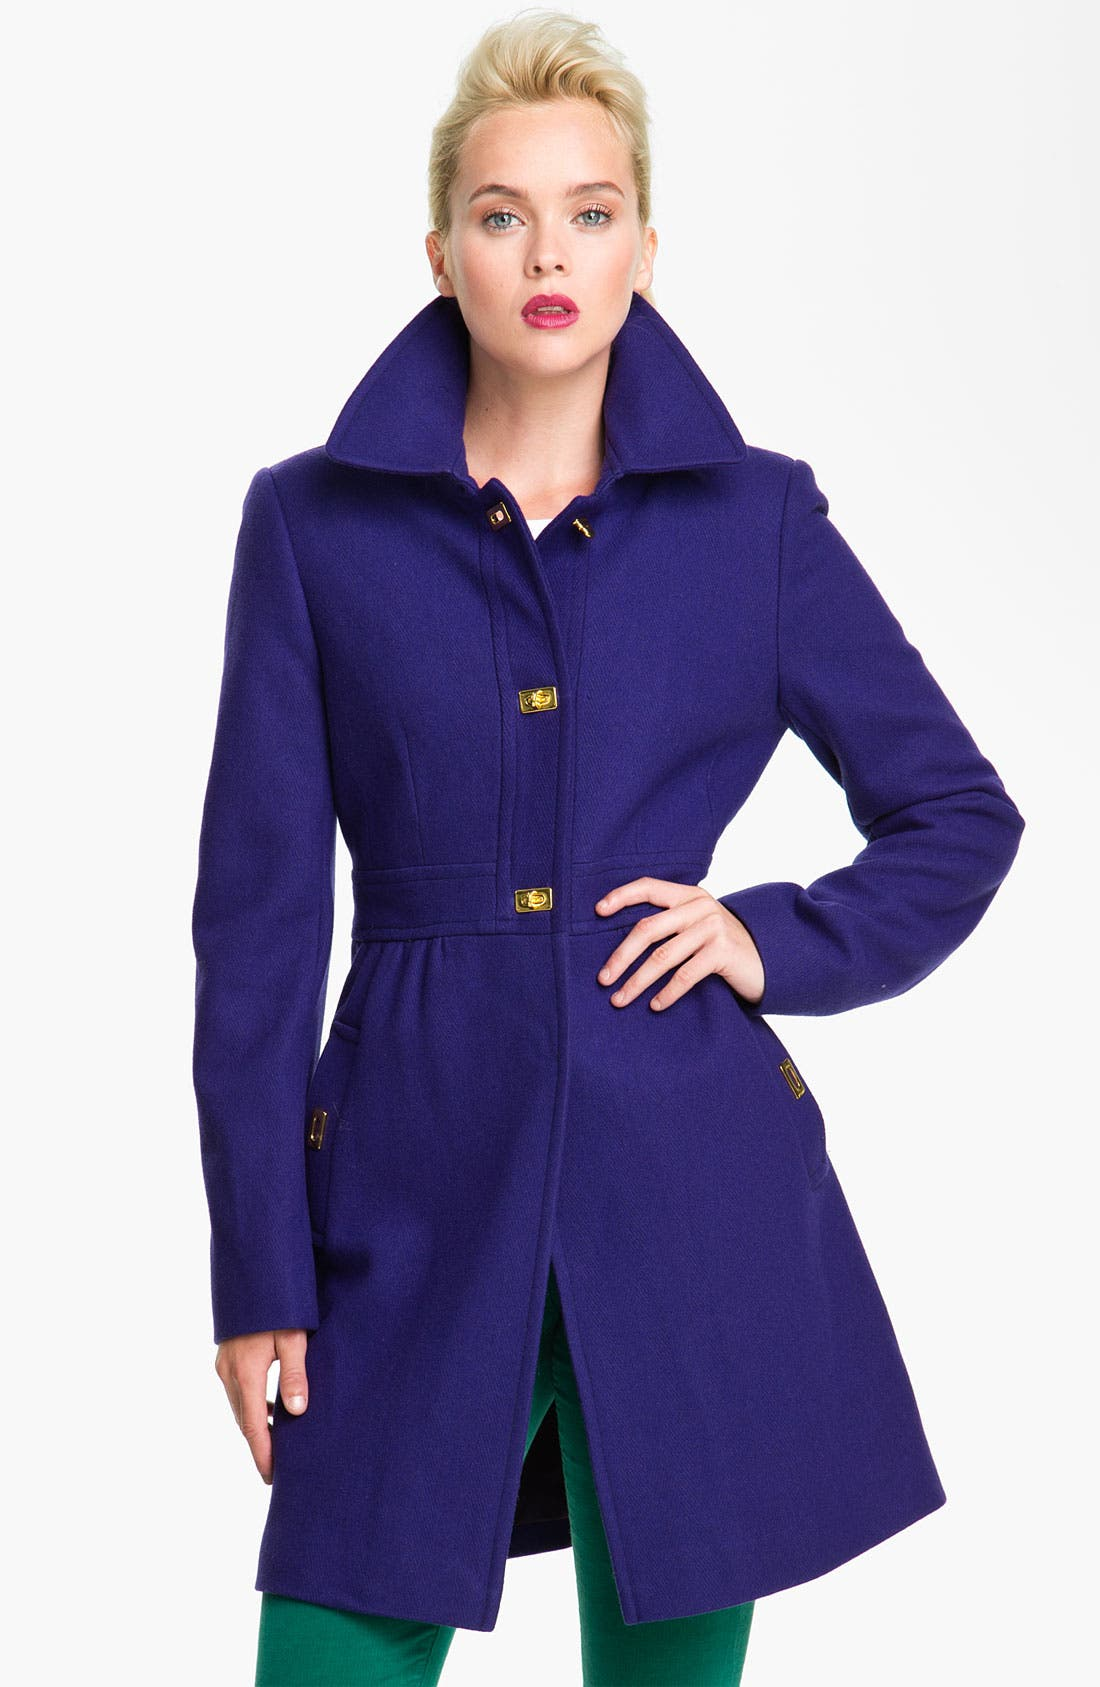 Alternate Image 1 Selected - DKNY 'Kendra' Turnkey Wool Blend Coat (Nordstrom Exclusive)